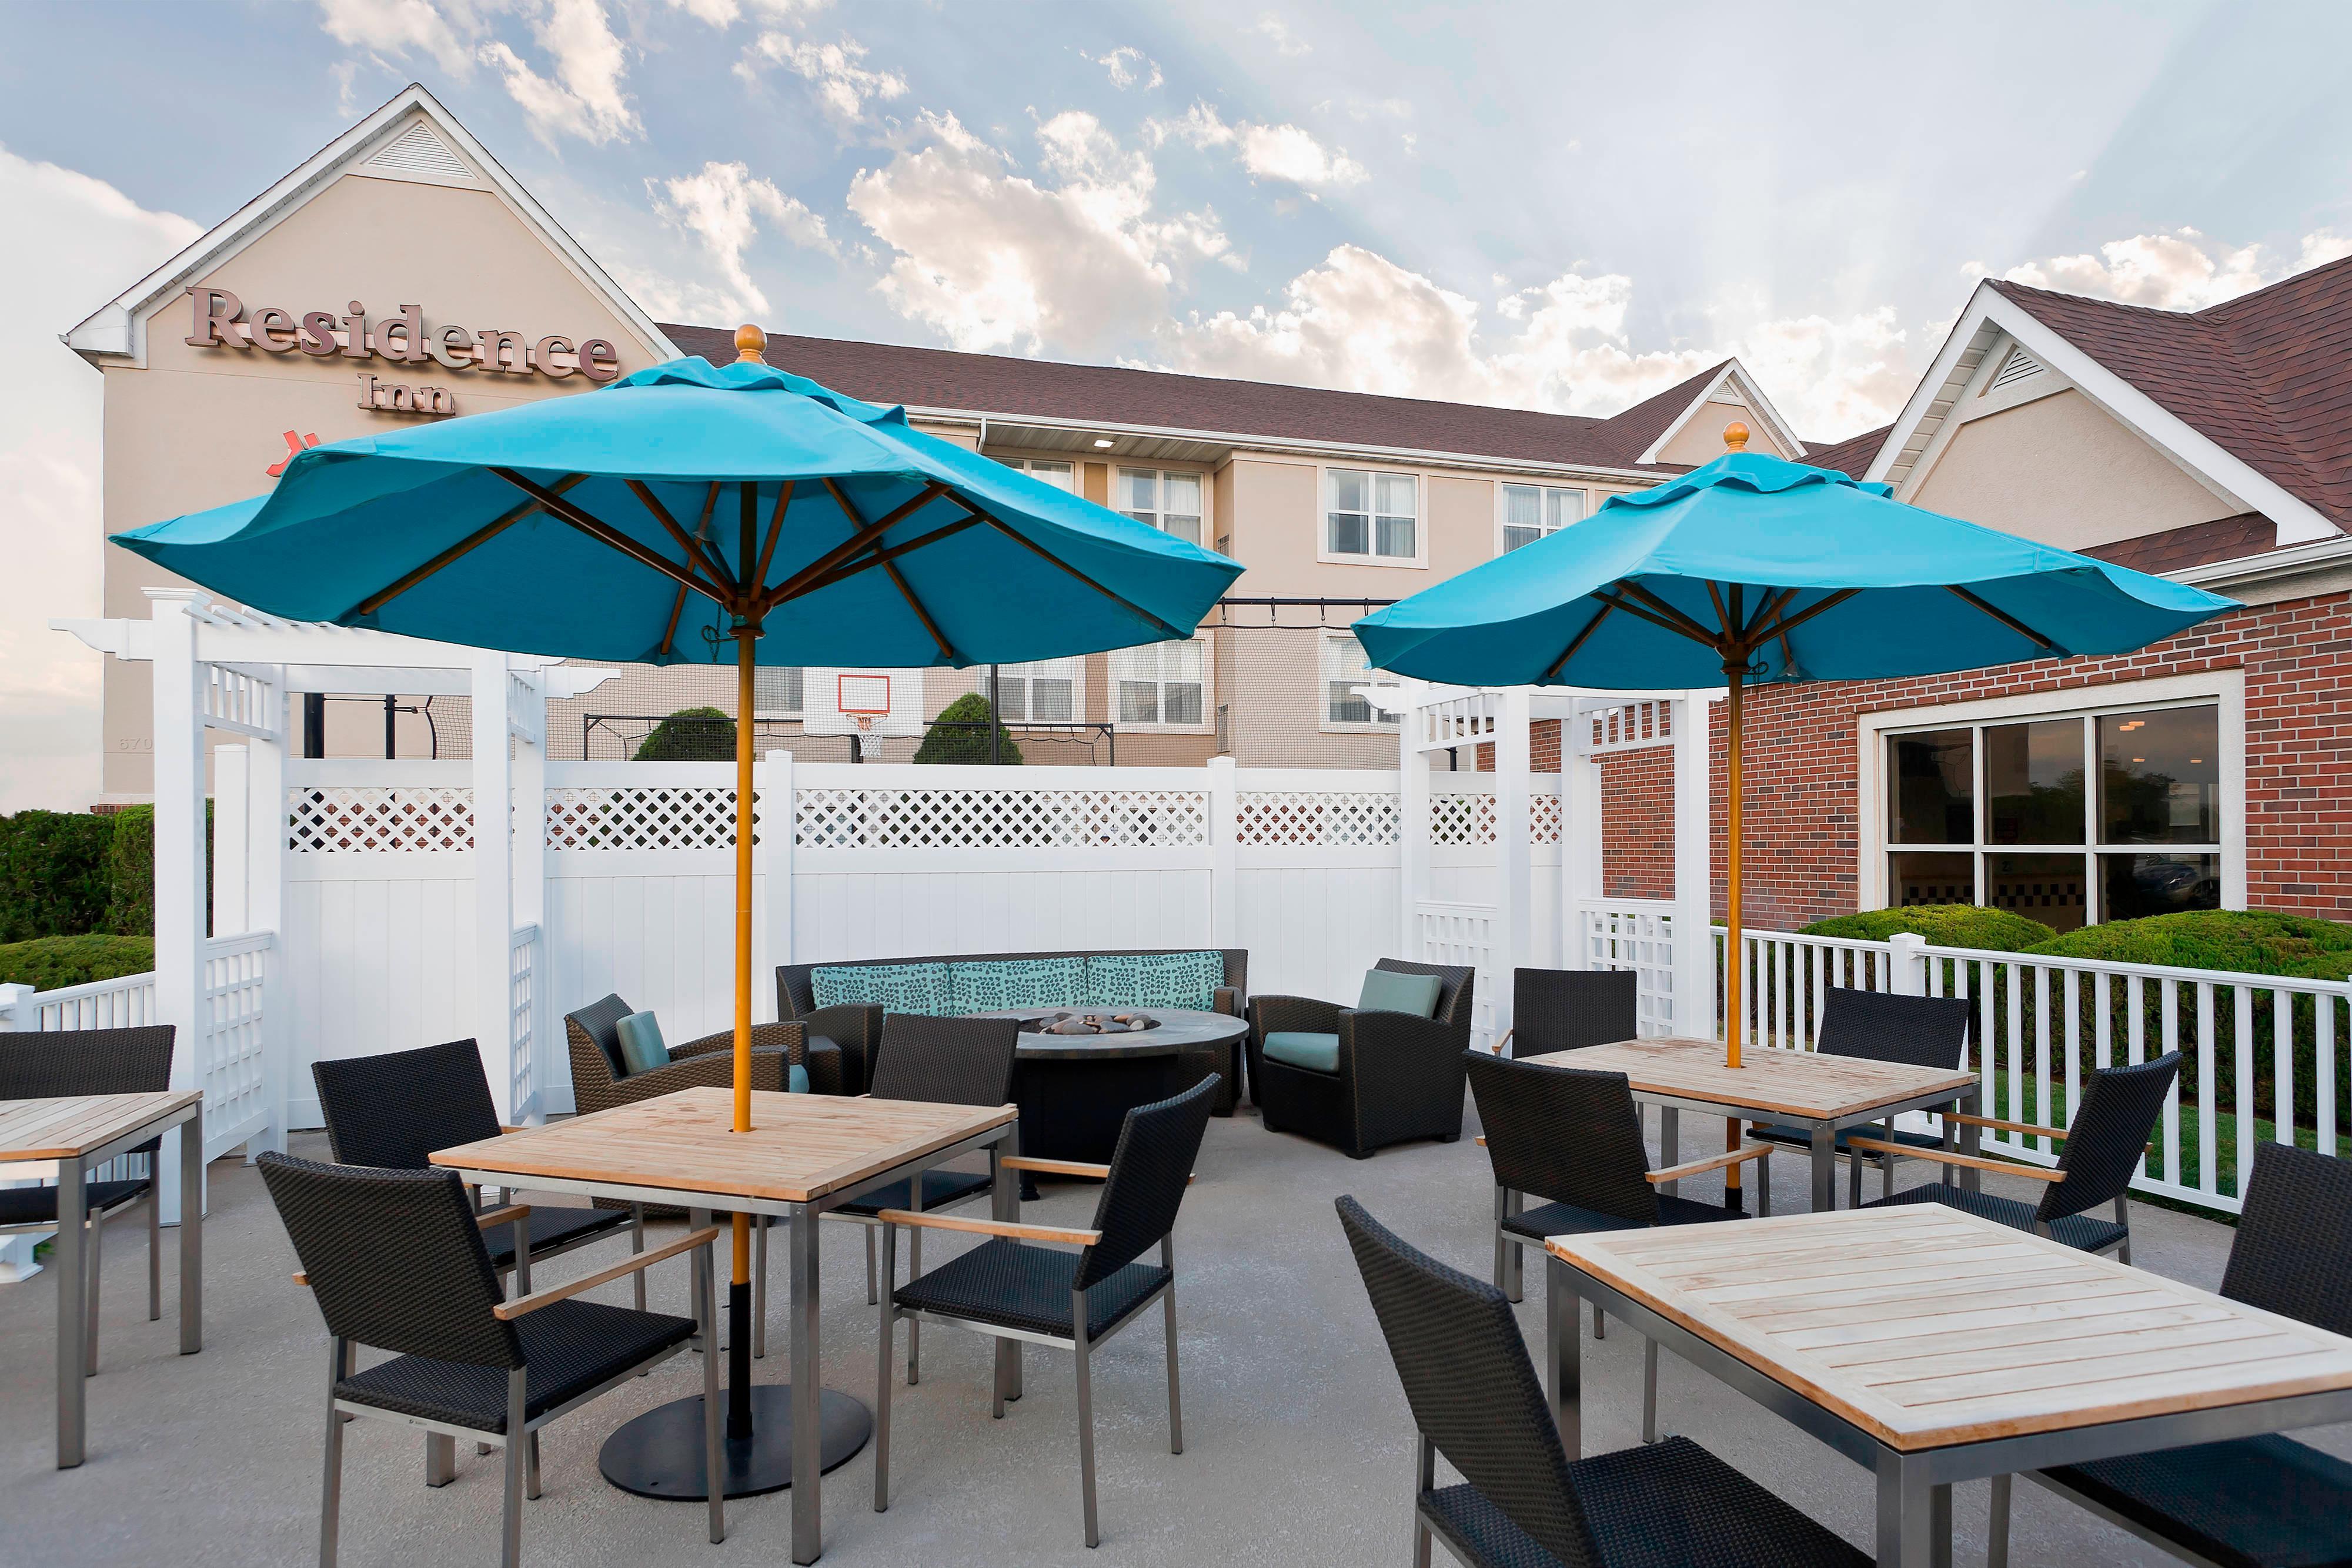 Residence Inn Amarill Marriott